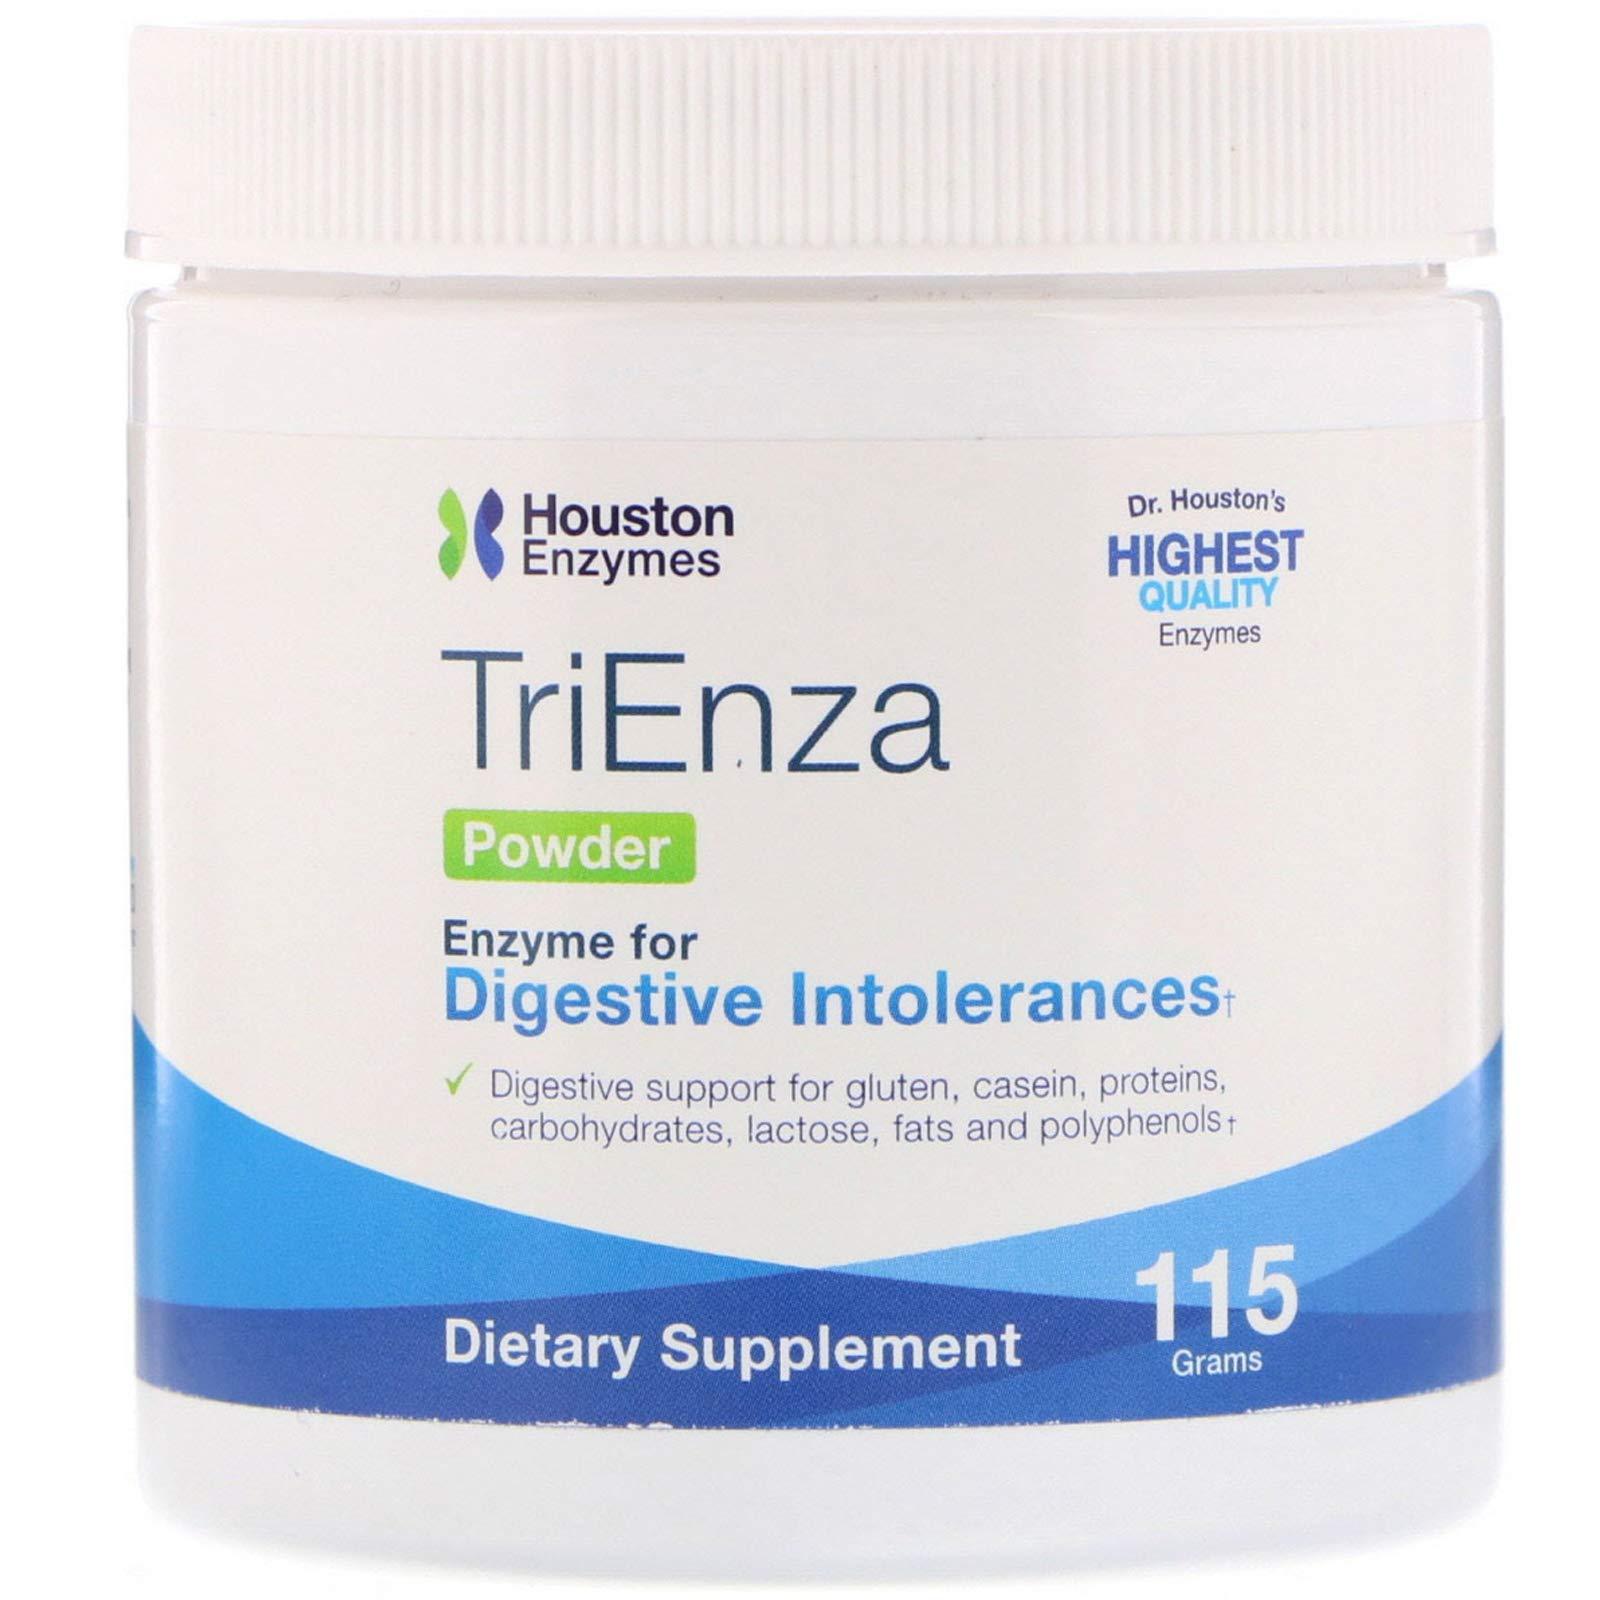 Houston Enzymes TriEnza Powder 115 g